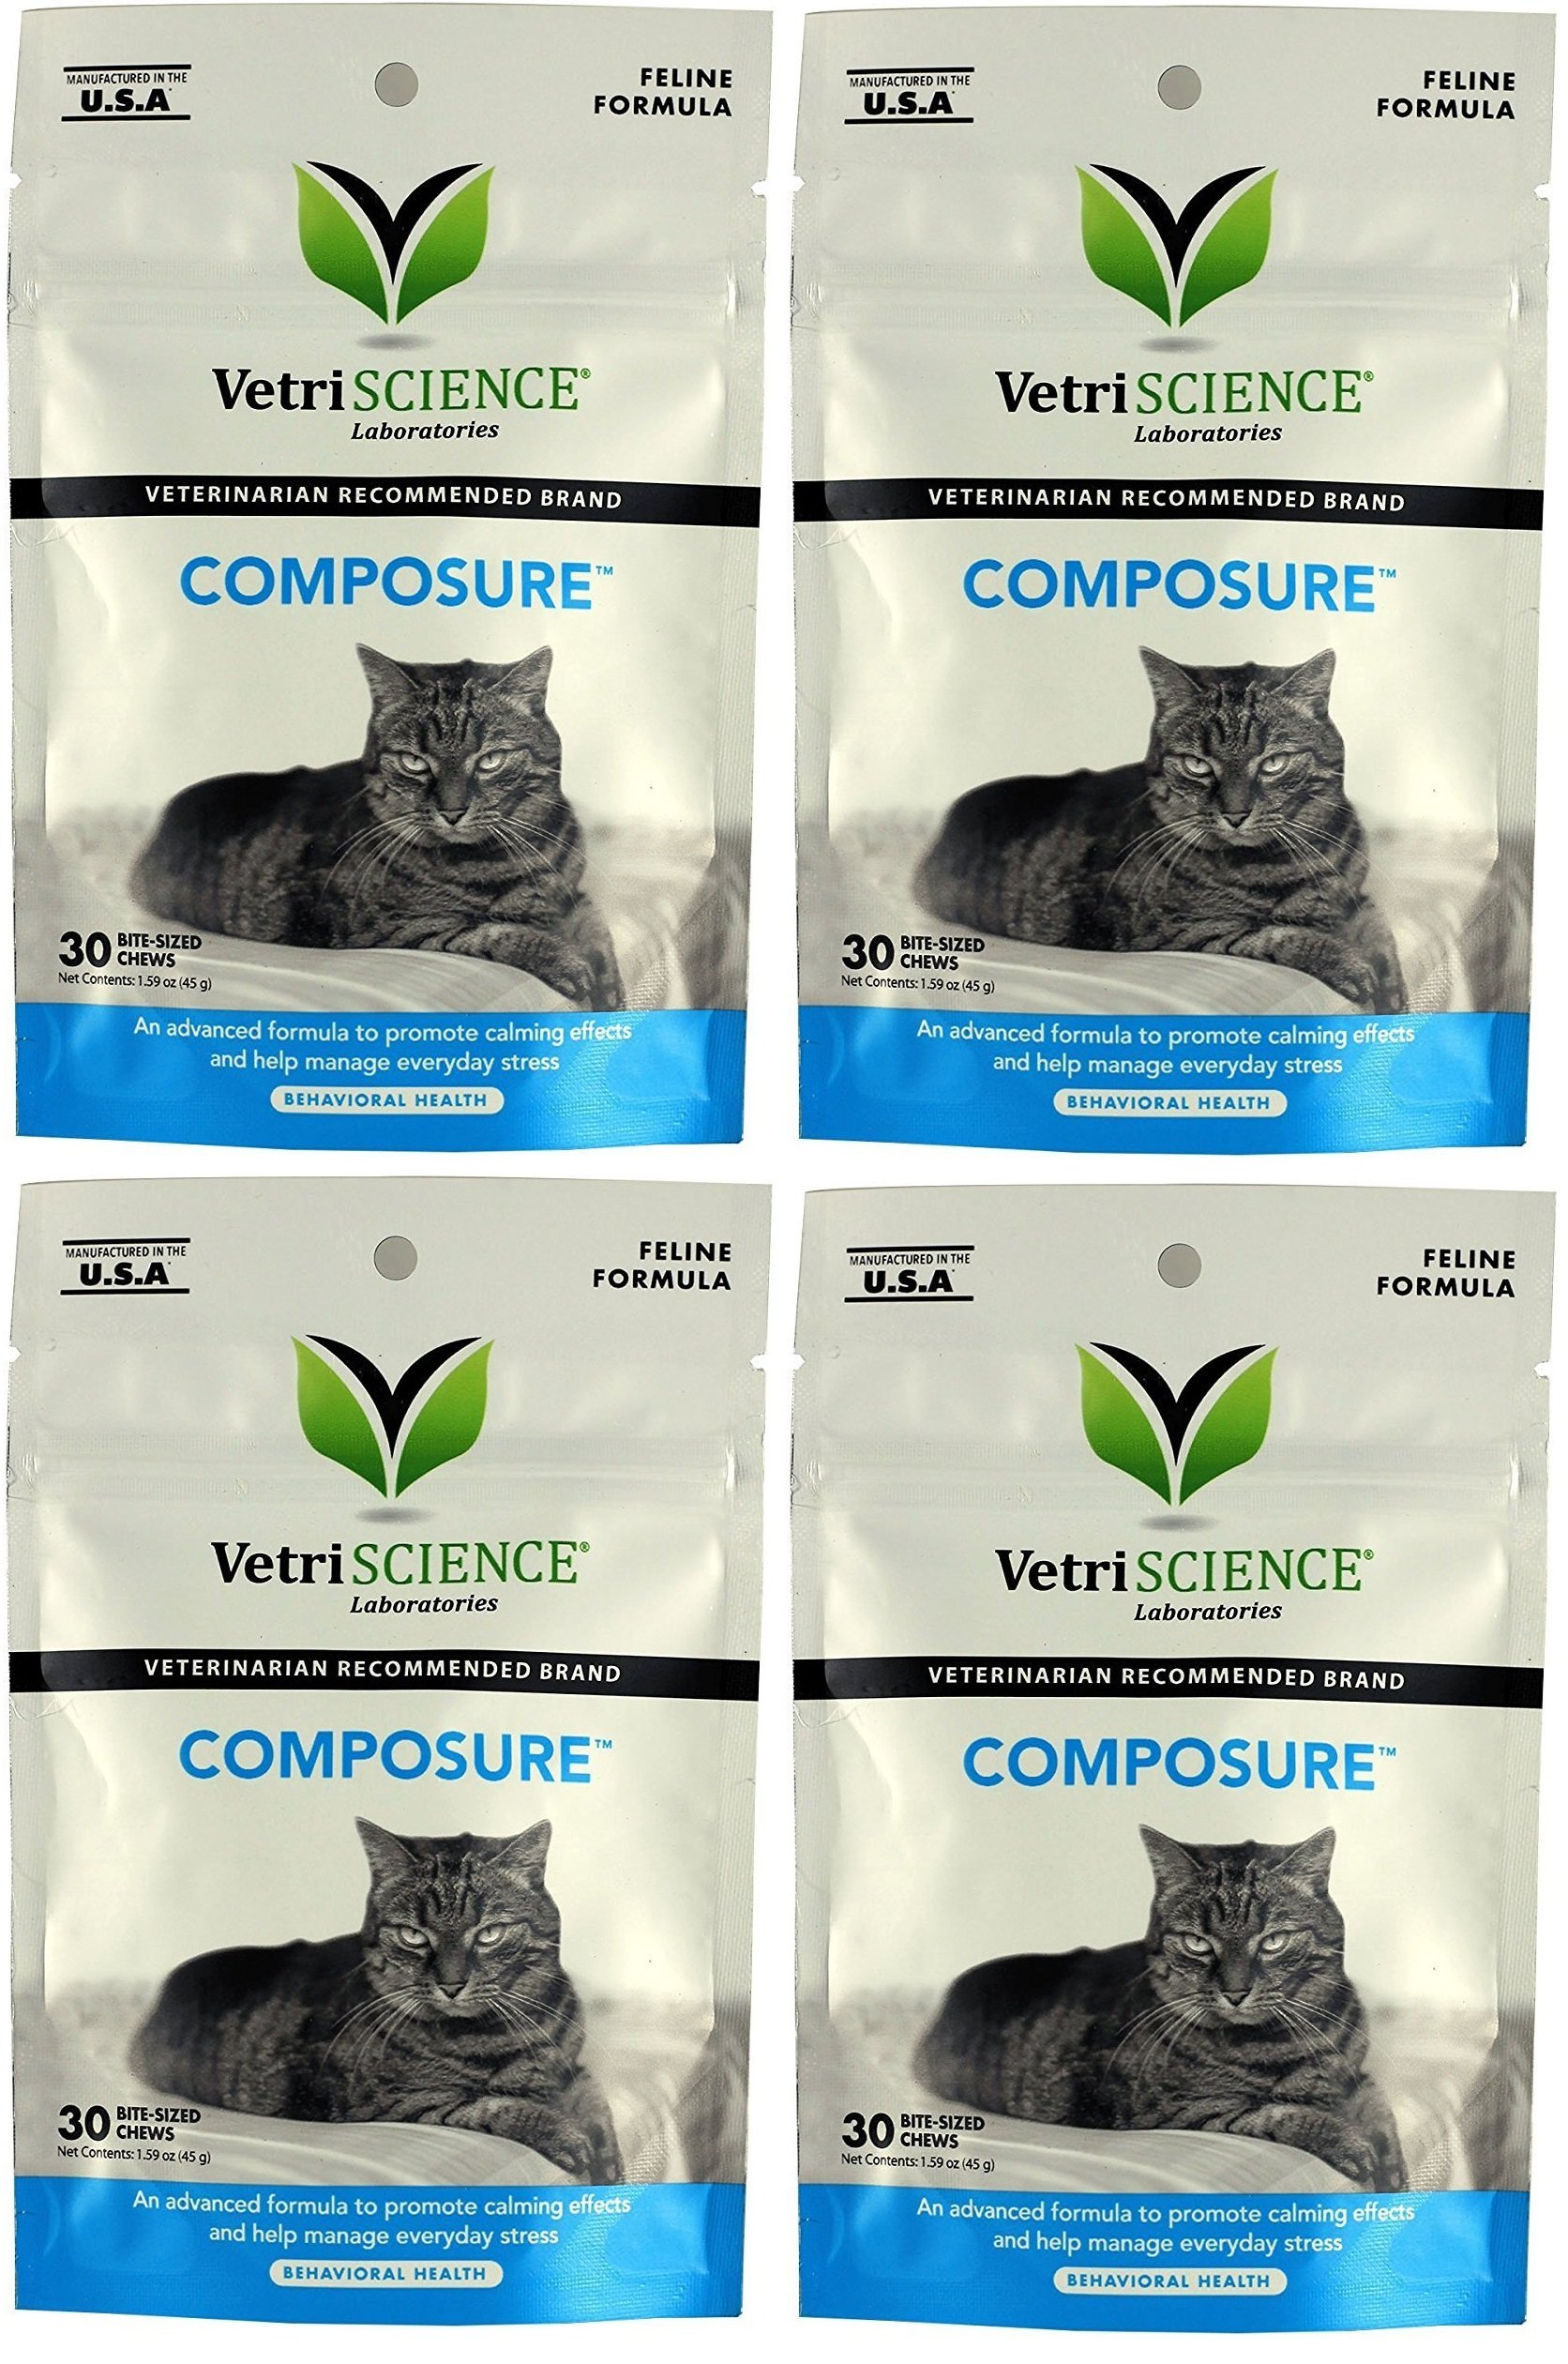 (4 Packages) VetriScience Laboratories - Composure Feline, 120 Bite-Sized Chews Total (30 Per Pack) by VetriScience